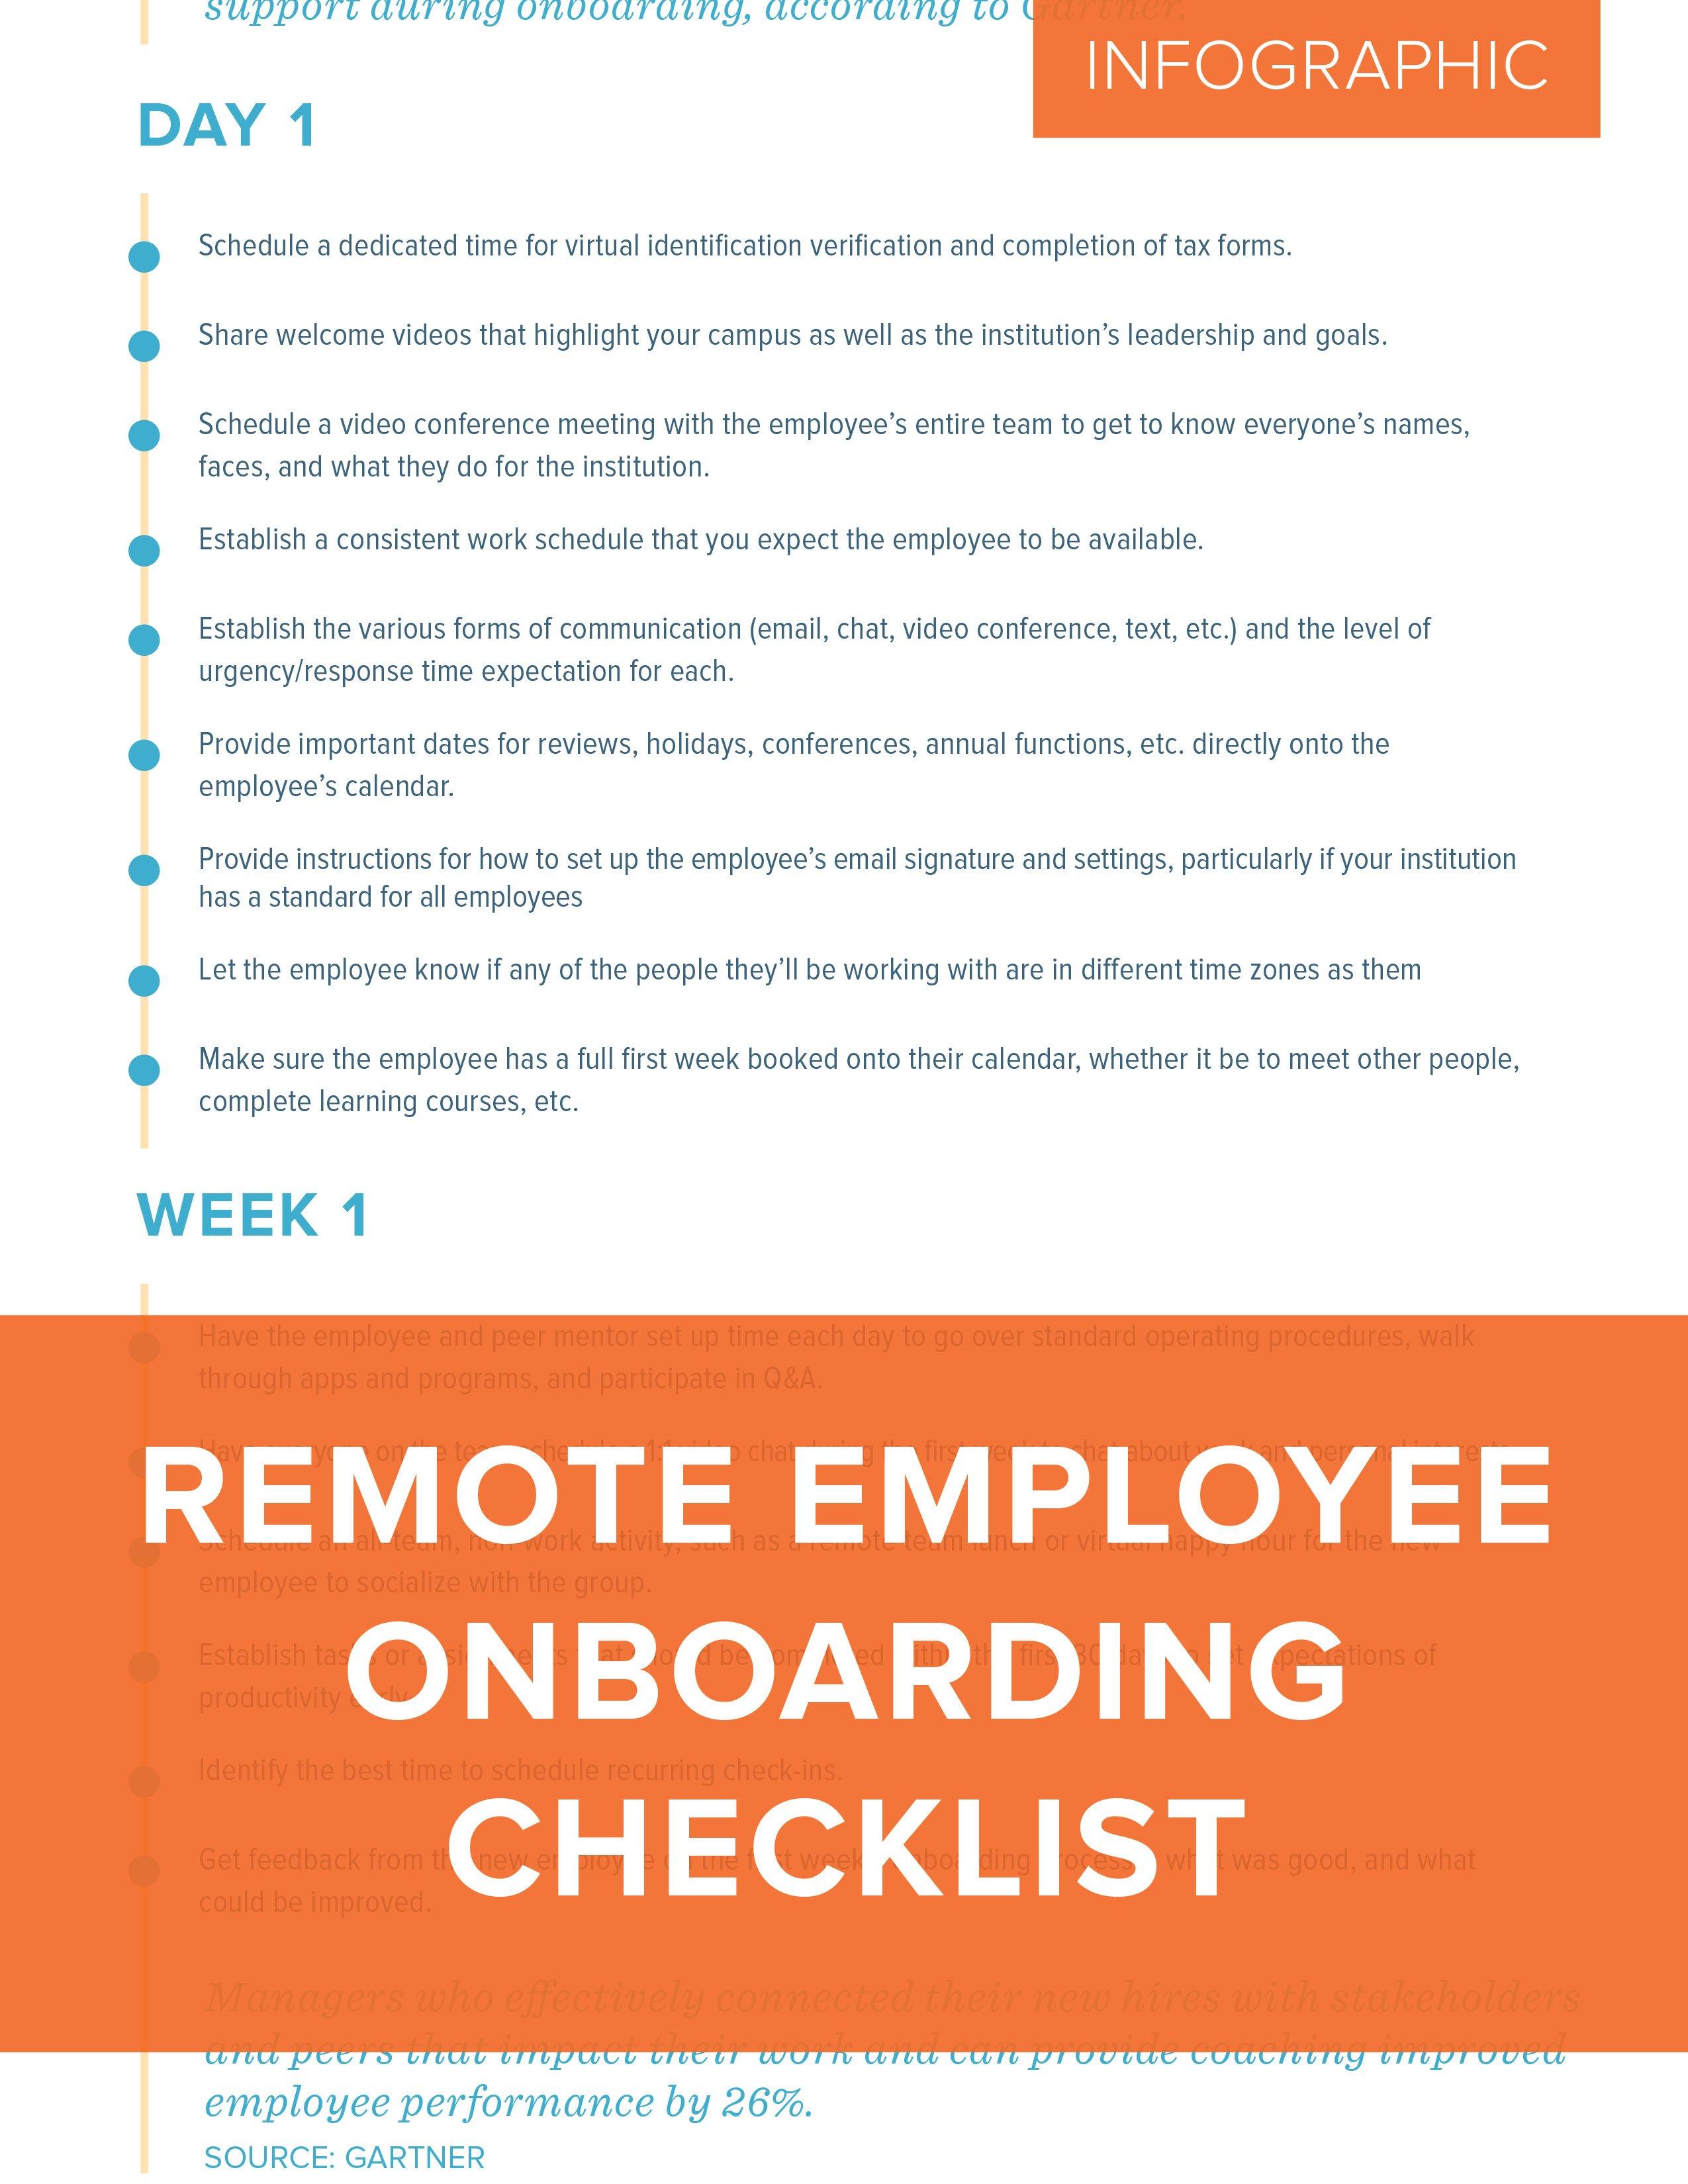 NEOGOV-Infographic-RemoteOnboardingChecklist-Thumbnail